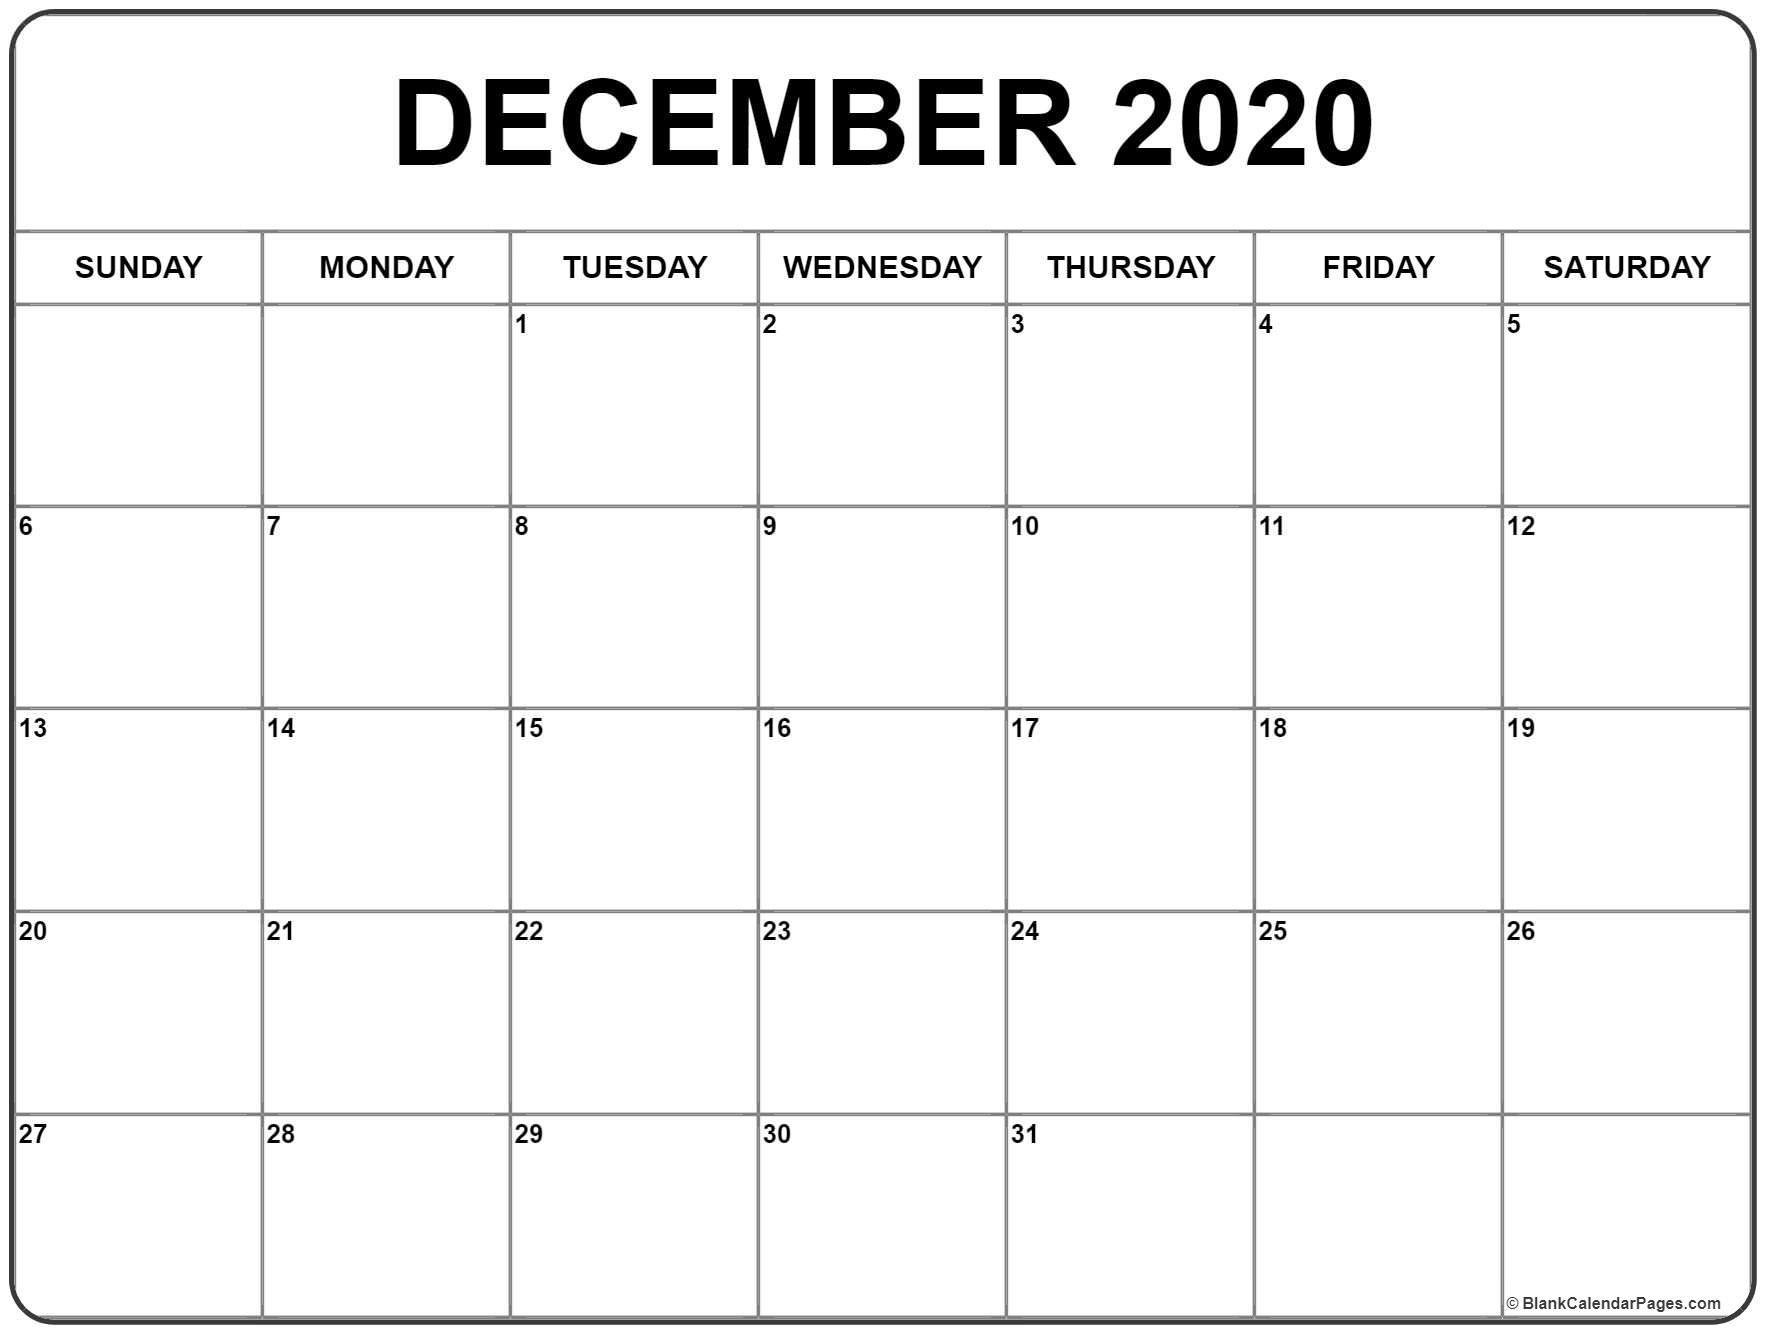 January Thru December 2020 Printable Monthly Calendar  Firefighter Calendar 2020 Printable